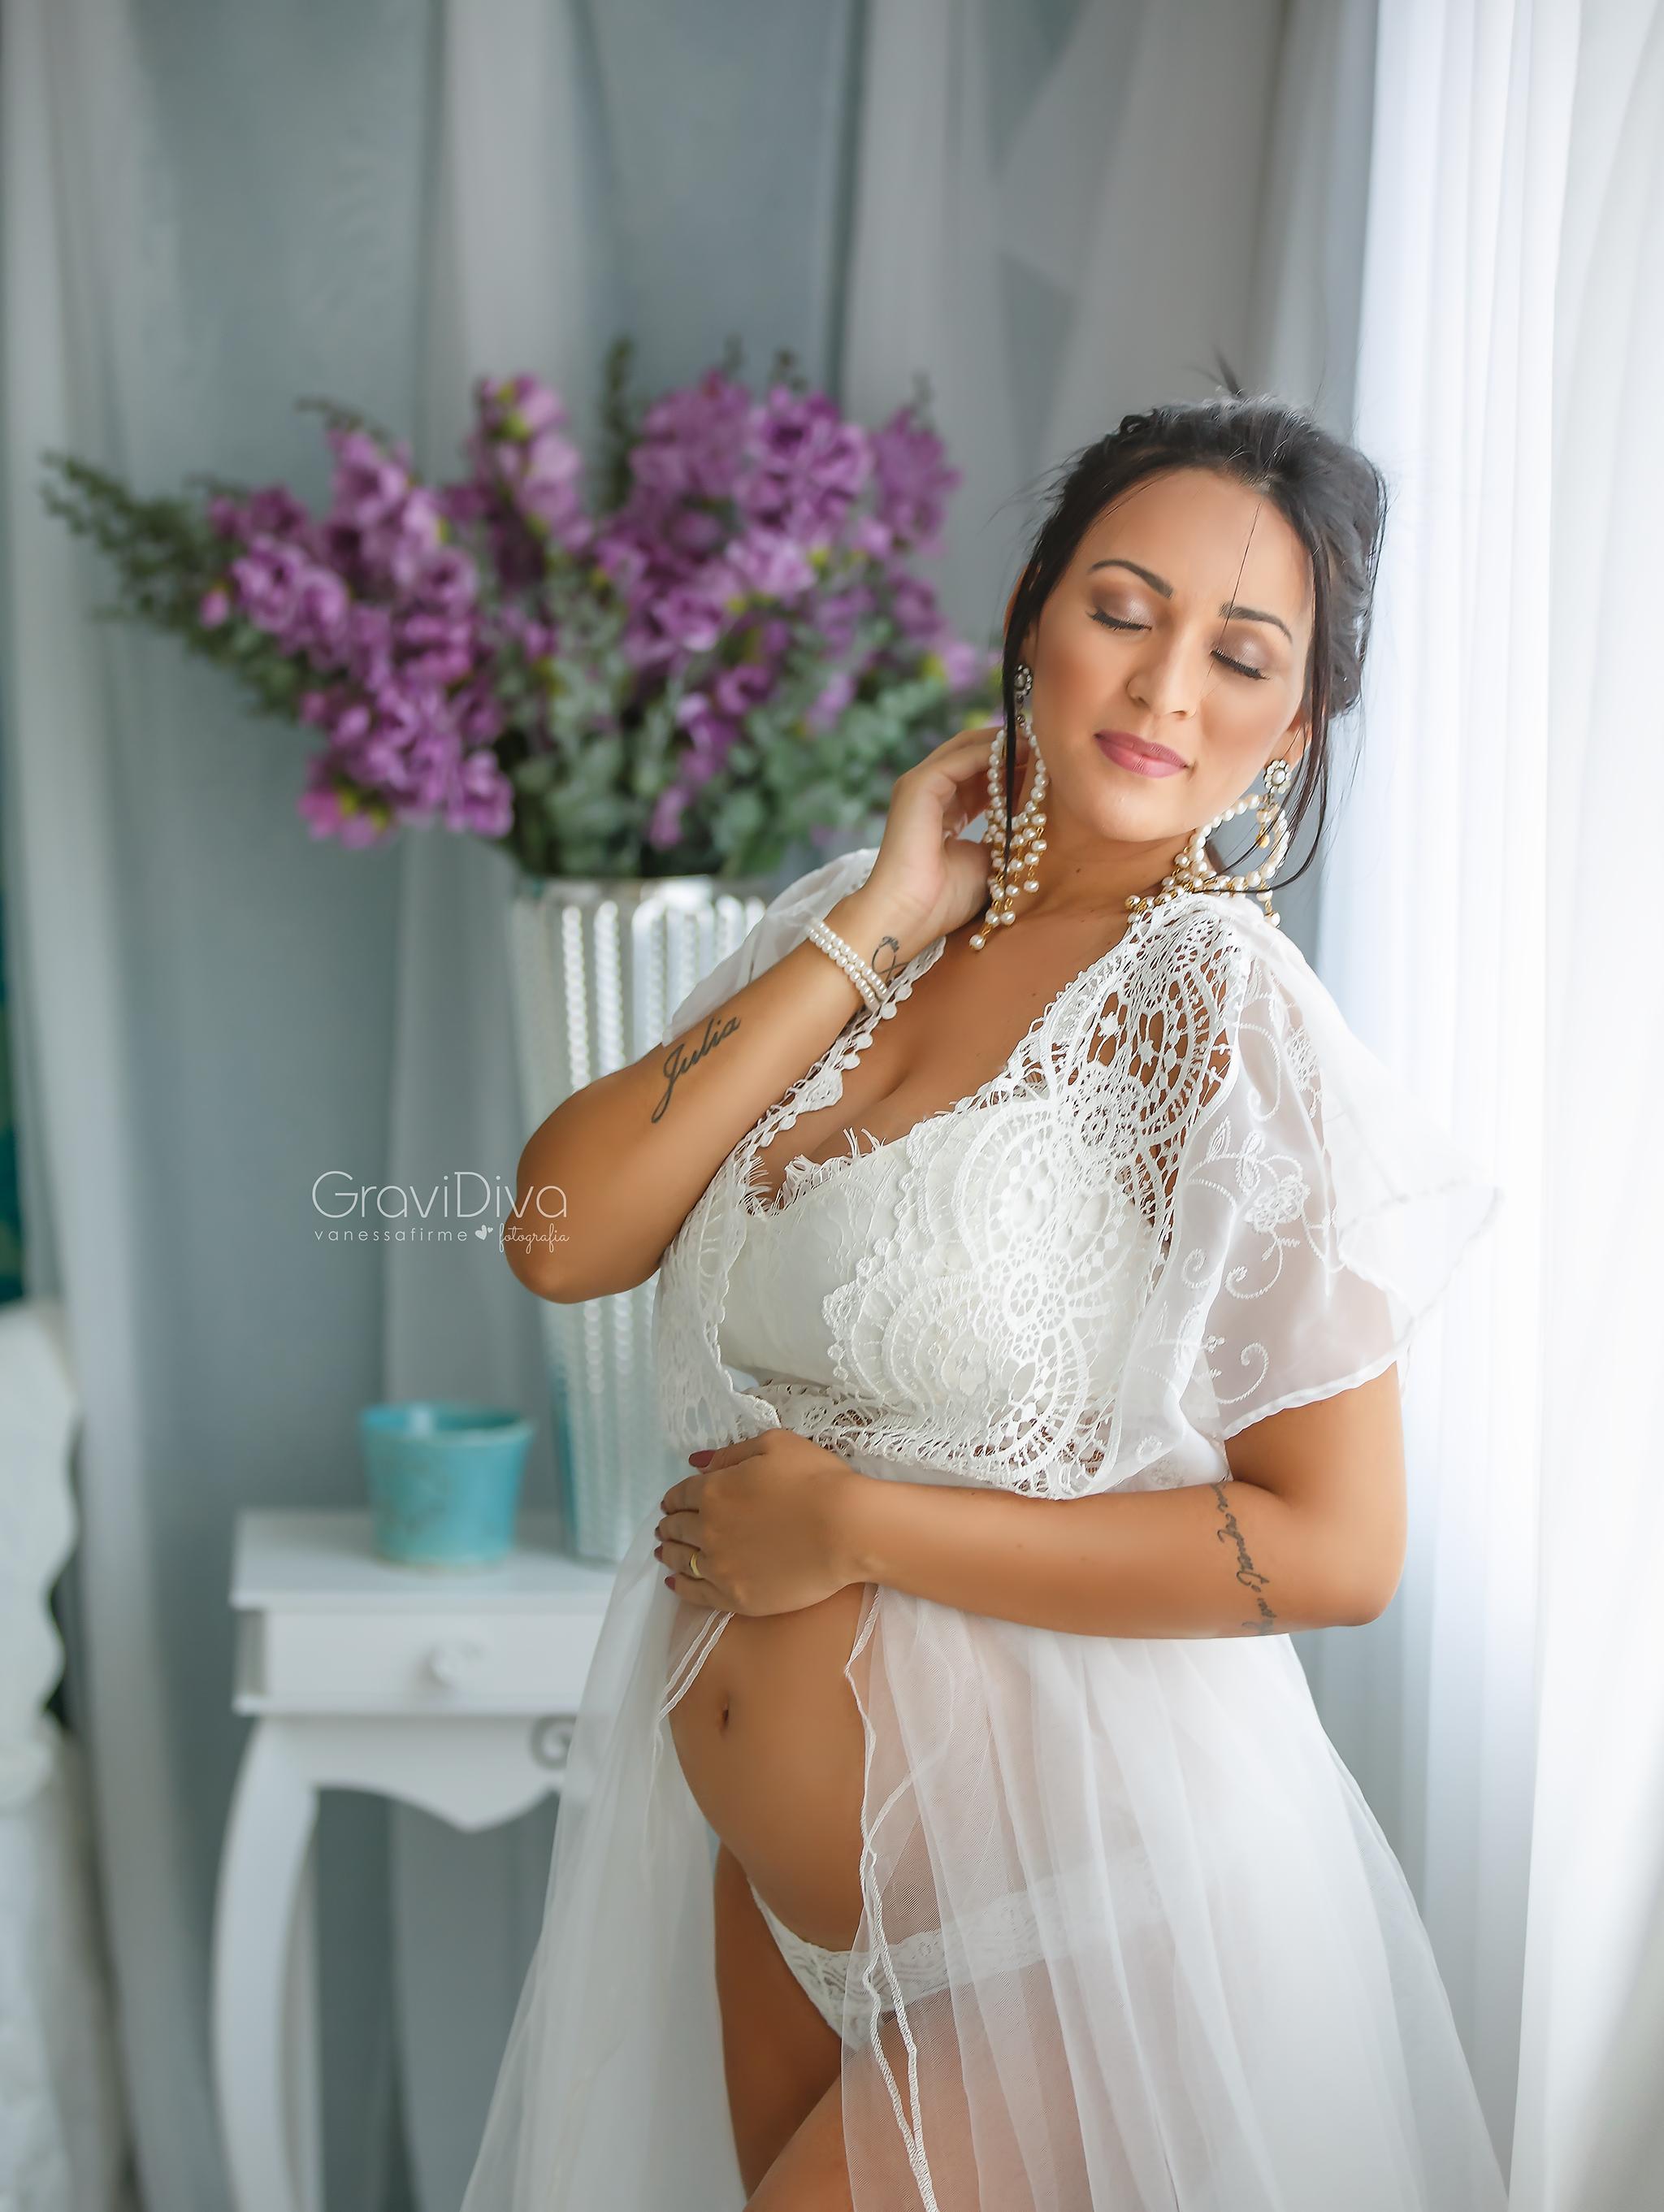 GRAVIDIVA, Fotos de gravida